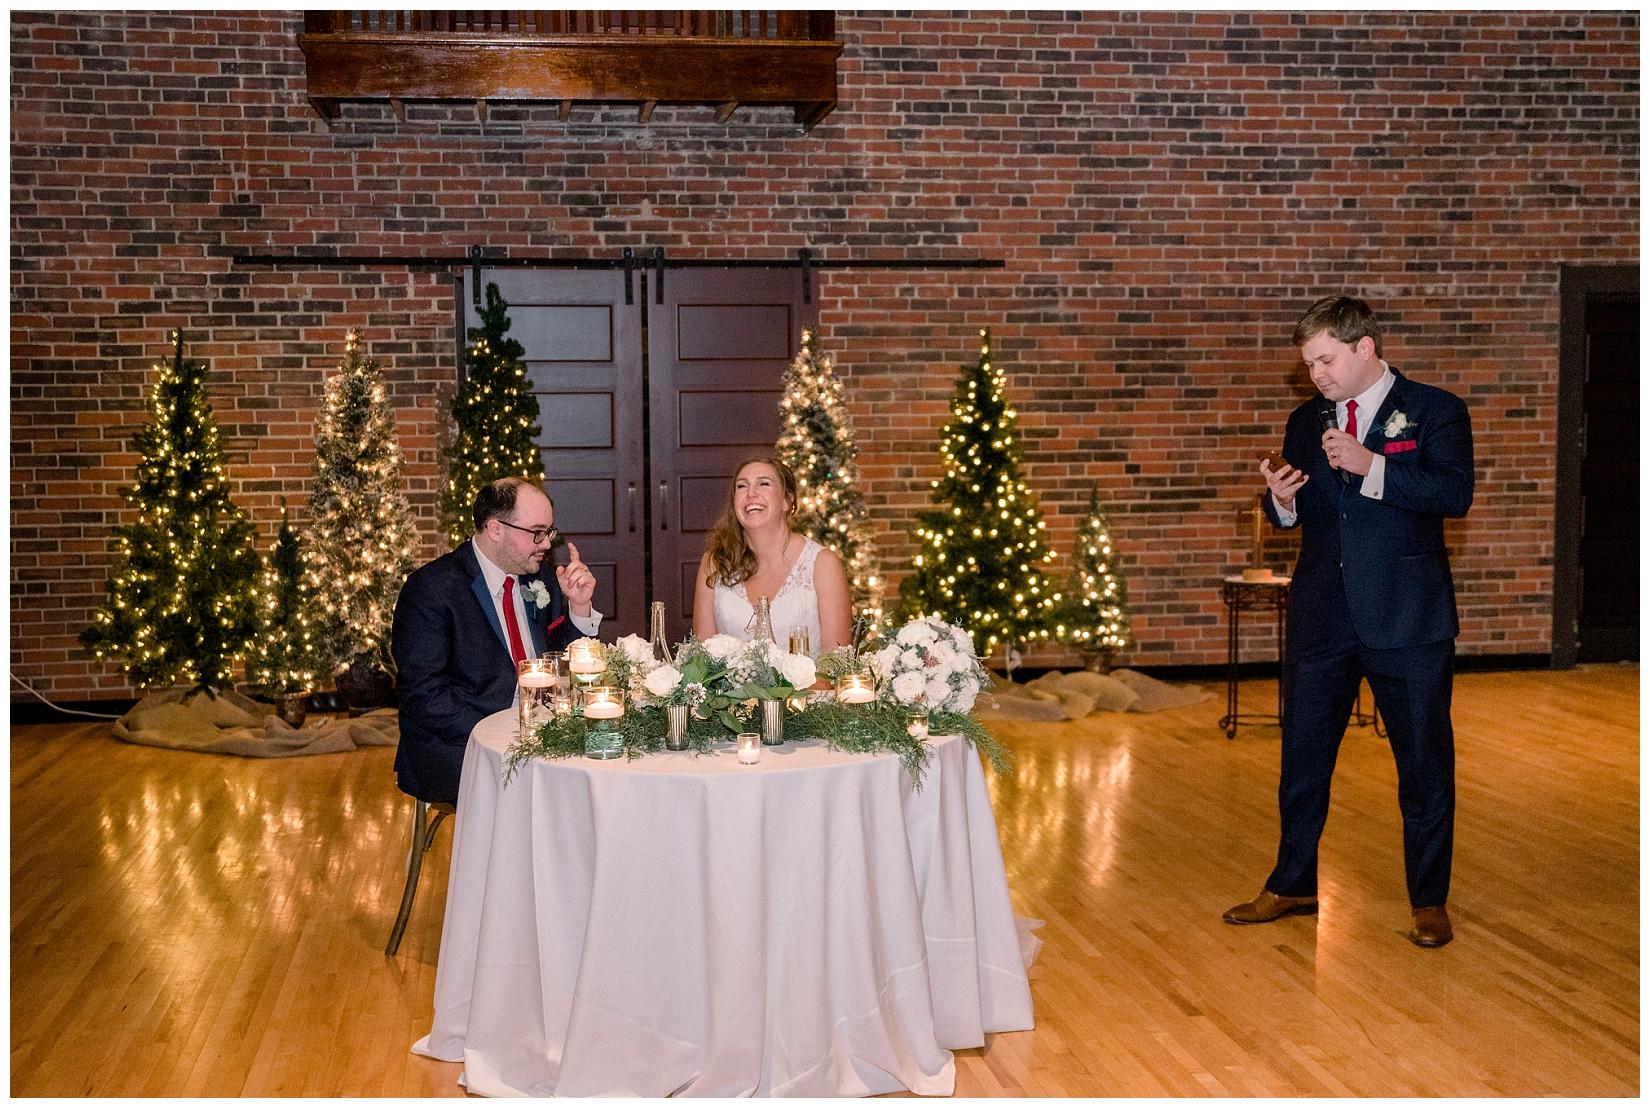 cat-alkire-wedding-photographer-indiana-chicago-indianapolis-fort-wayne_0996.jpg